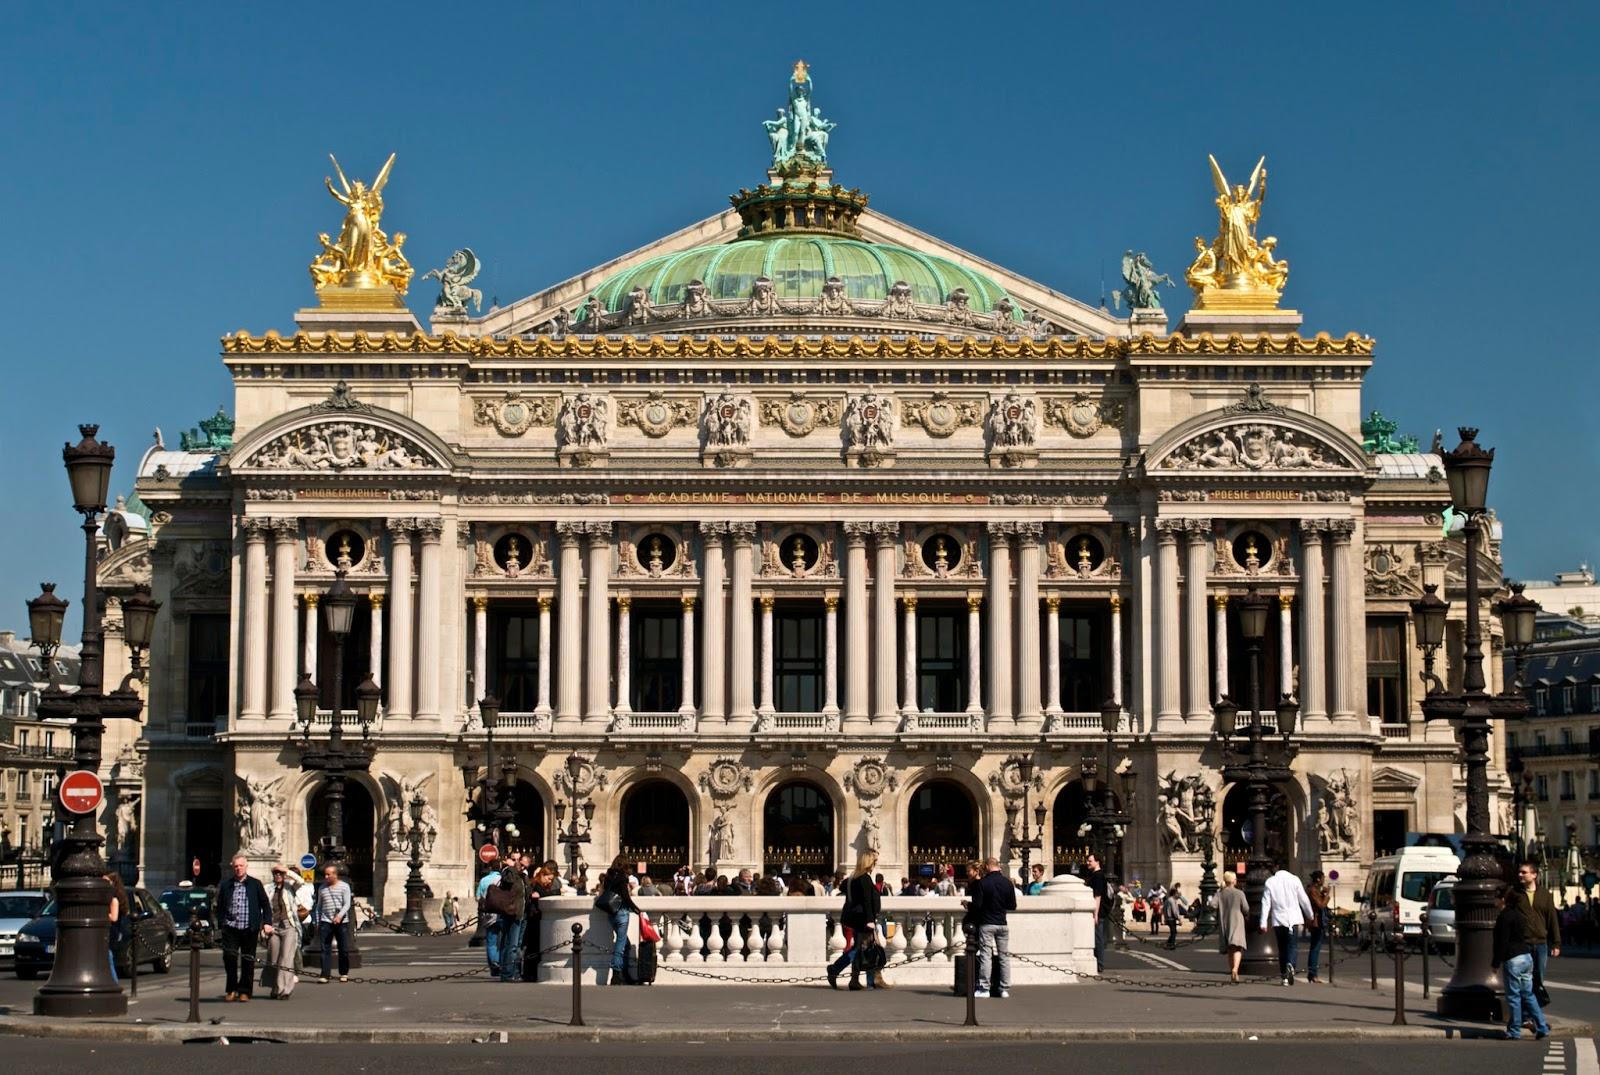 visite guidee paris - visite guidee opera garnier - opera garnier - architecture parisienne